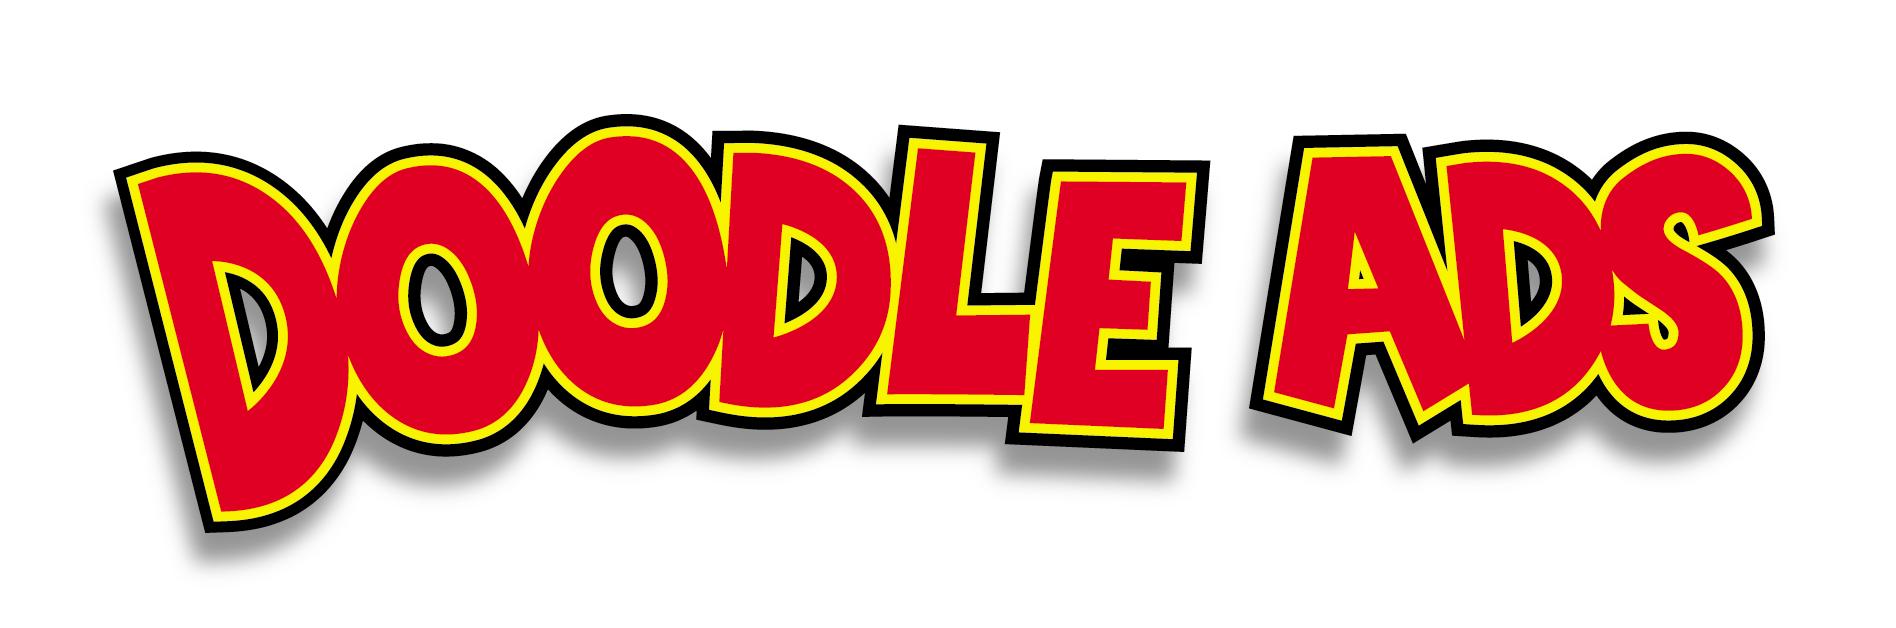 DoodleAdsLogo